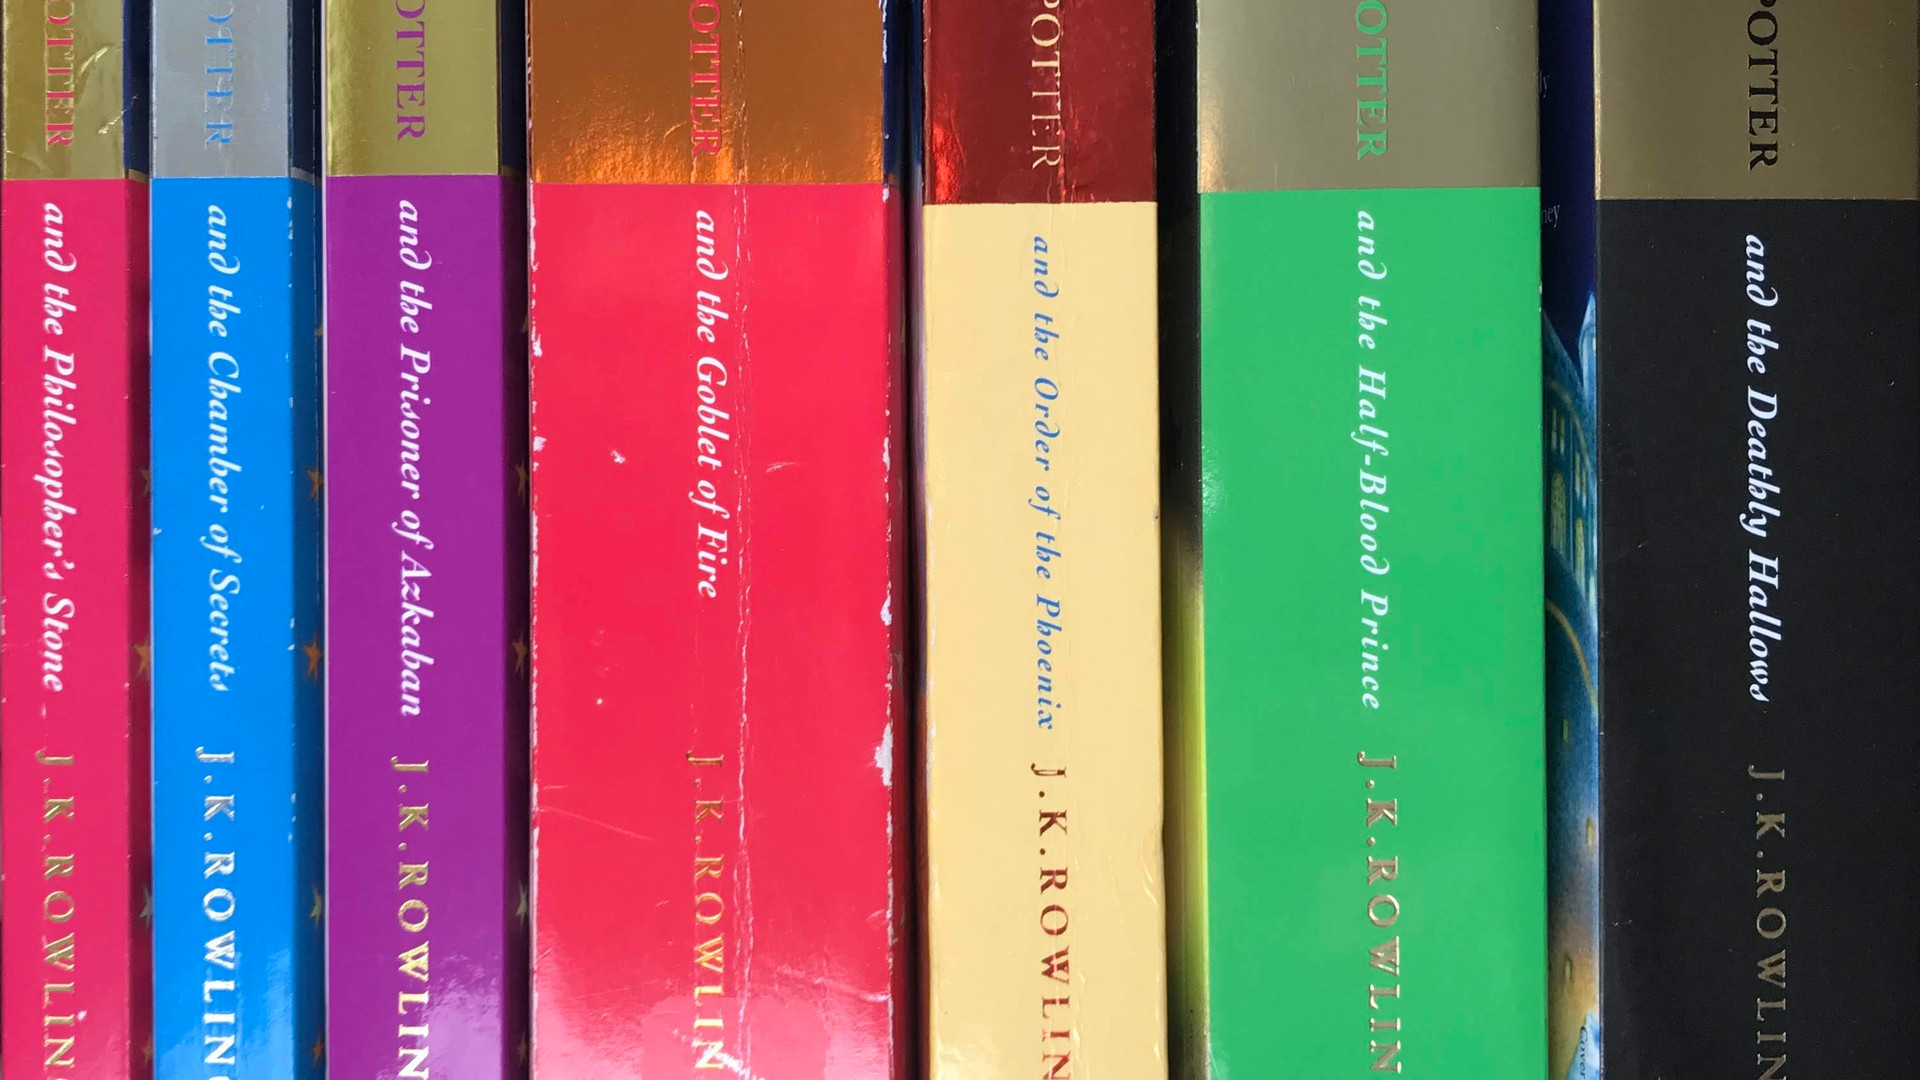 Celebratory Editions